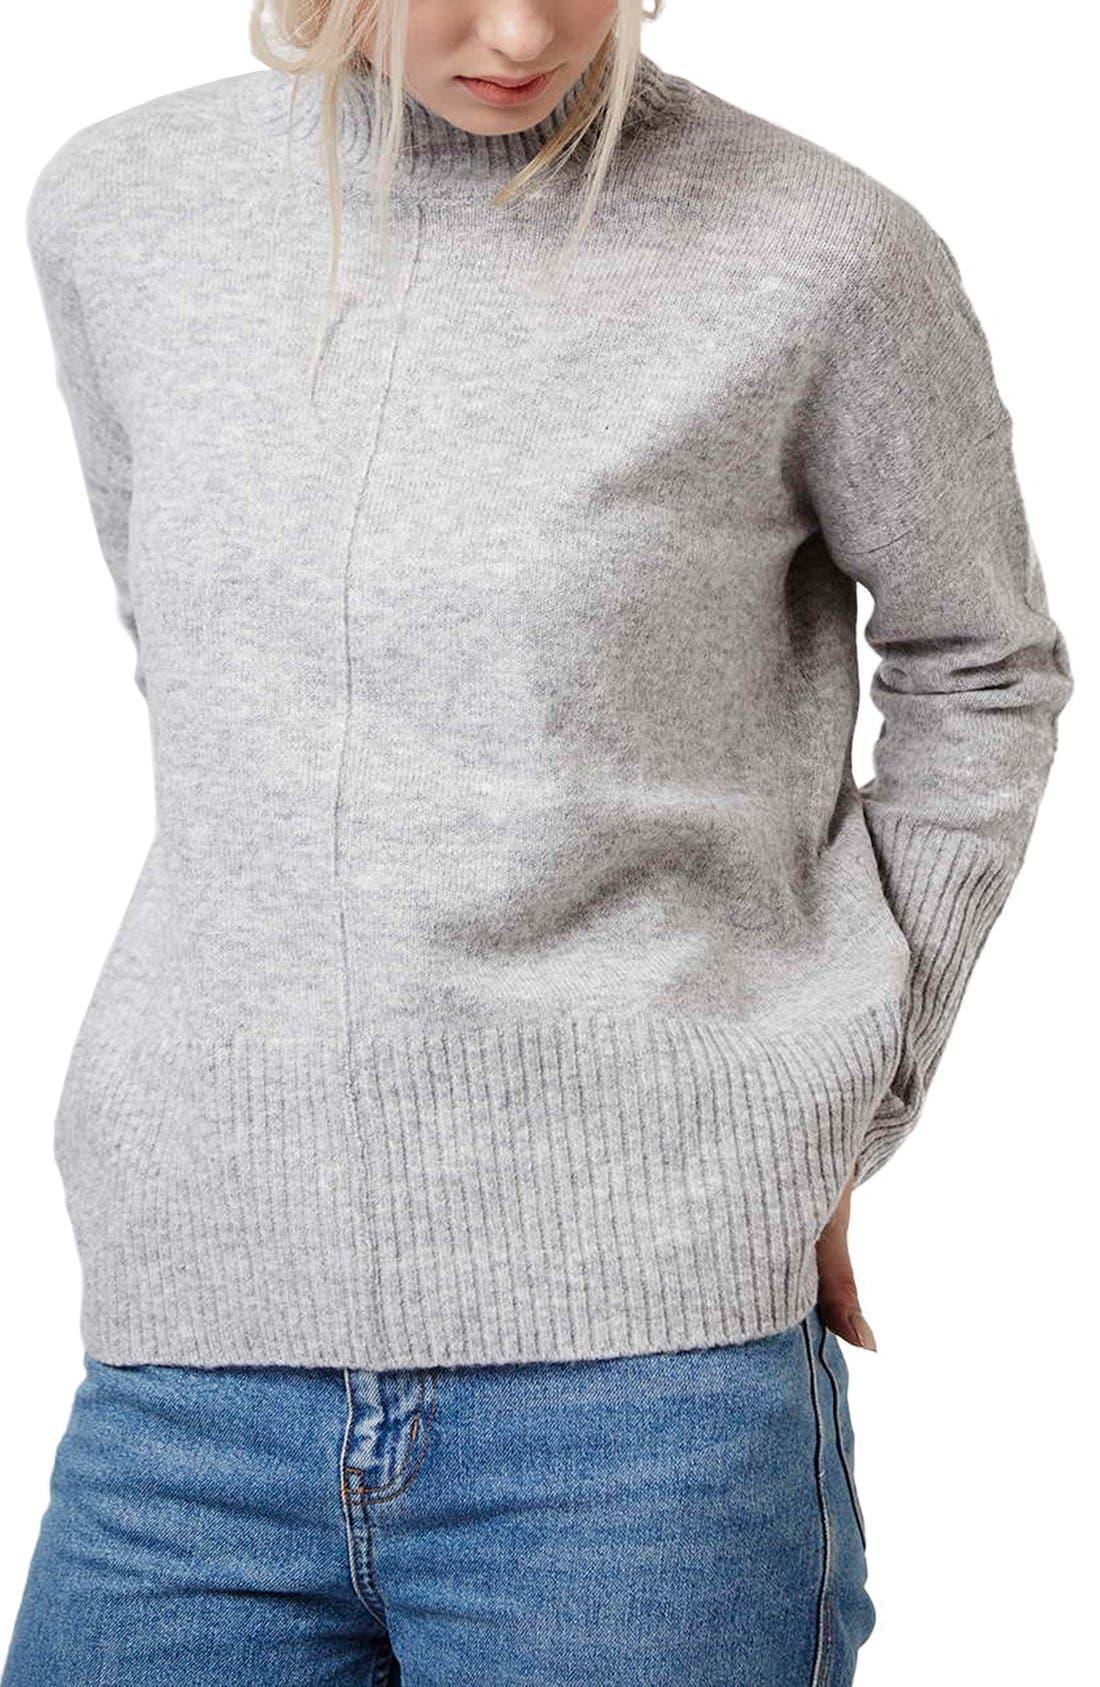 Alternate Image 1 Selected - Topshop Oversize Funnel Neck Sweater